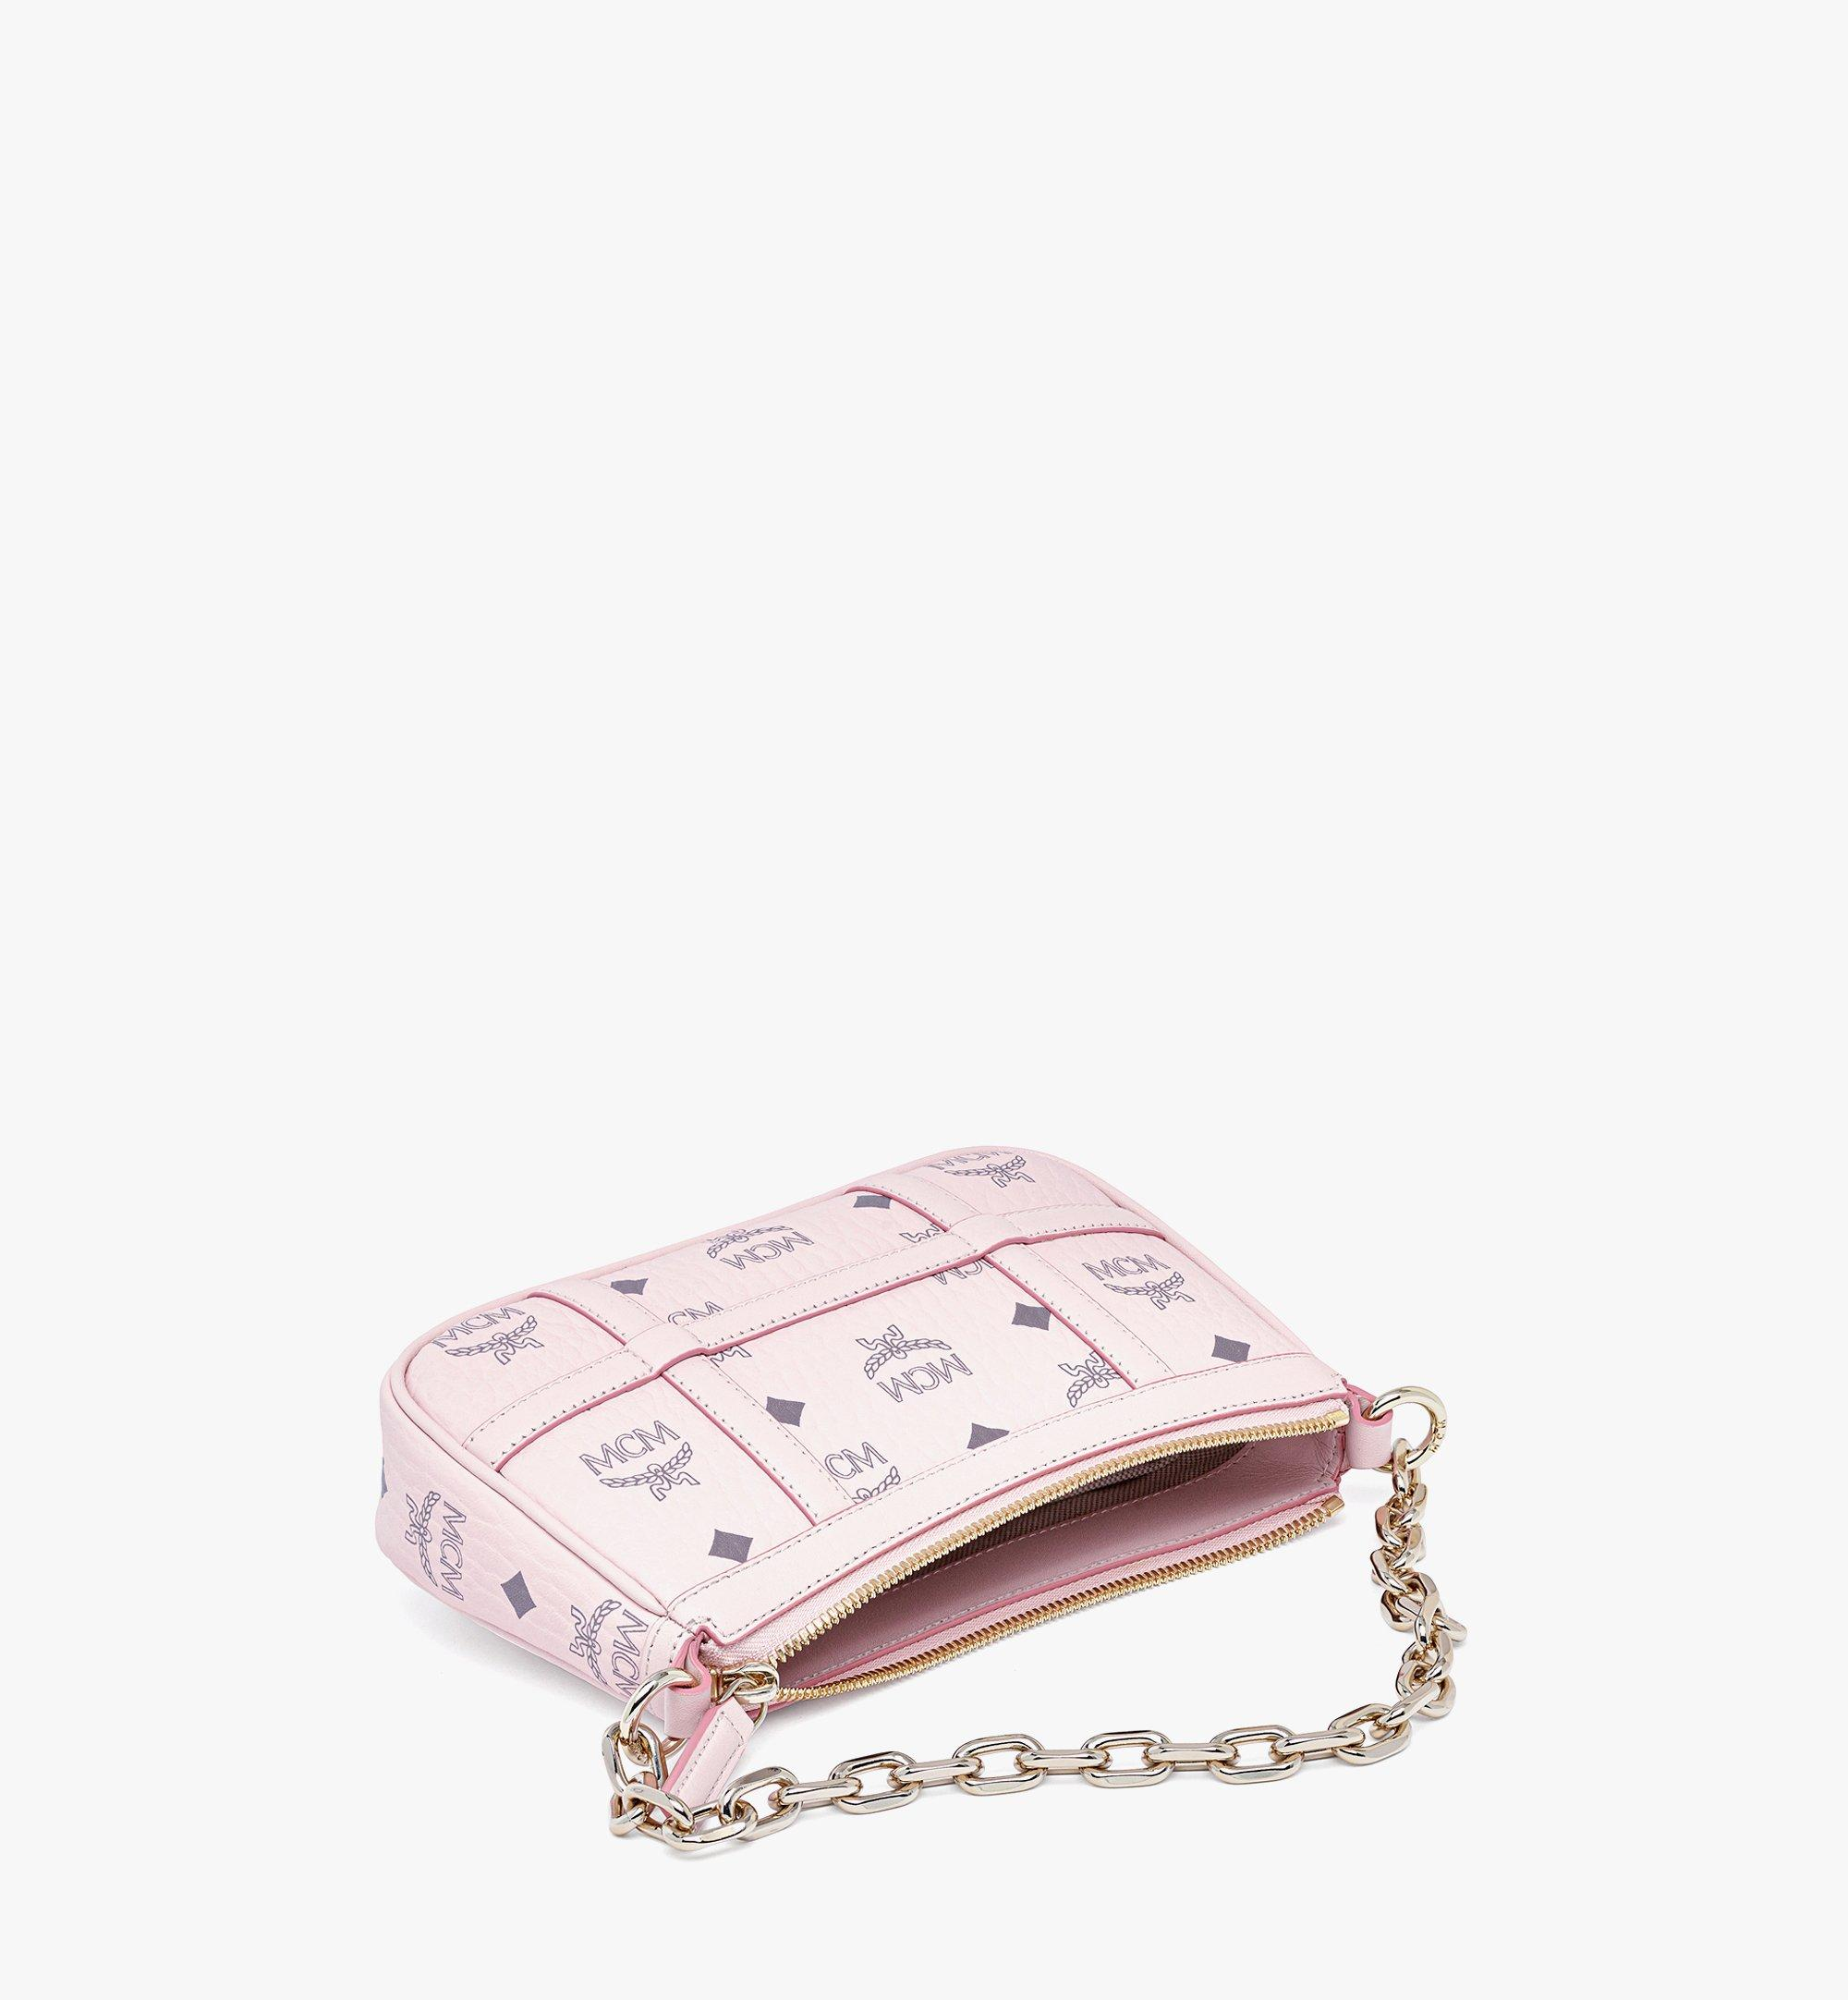 MCM Delmy Shoulder Bag in Visetos Pink MWSBAER01QH001 Alternate View 2